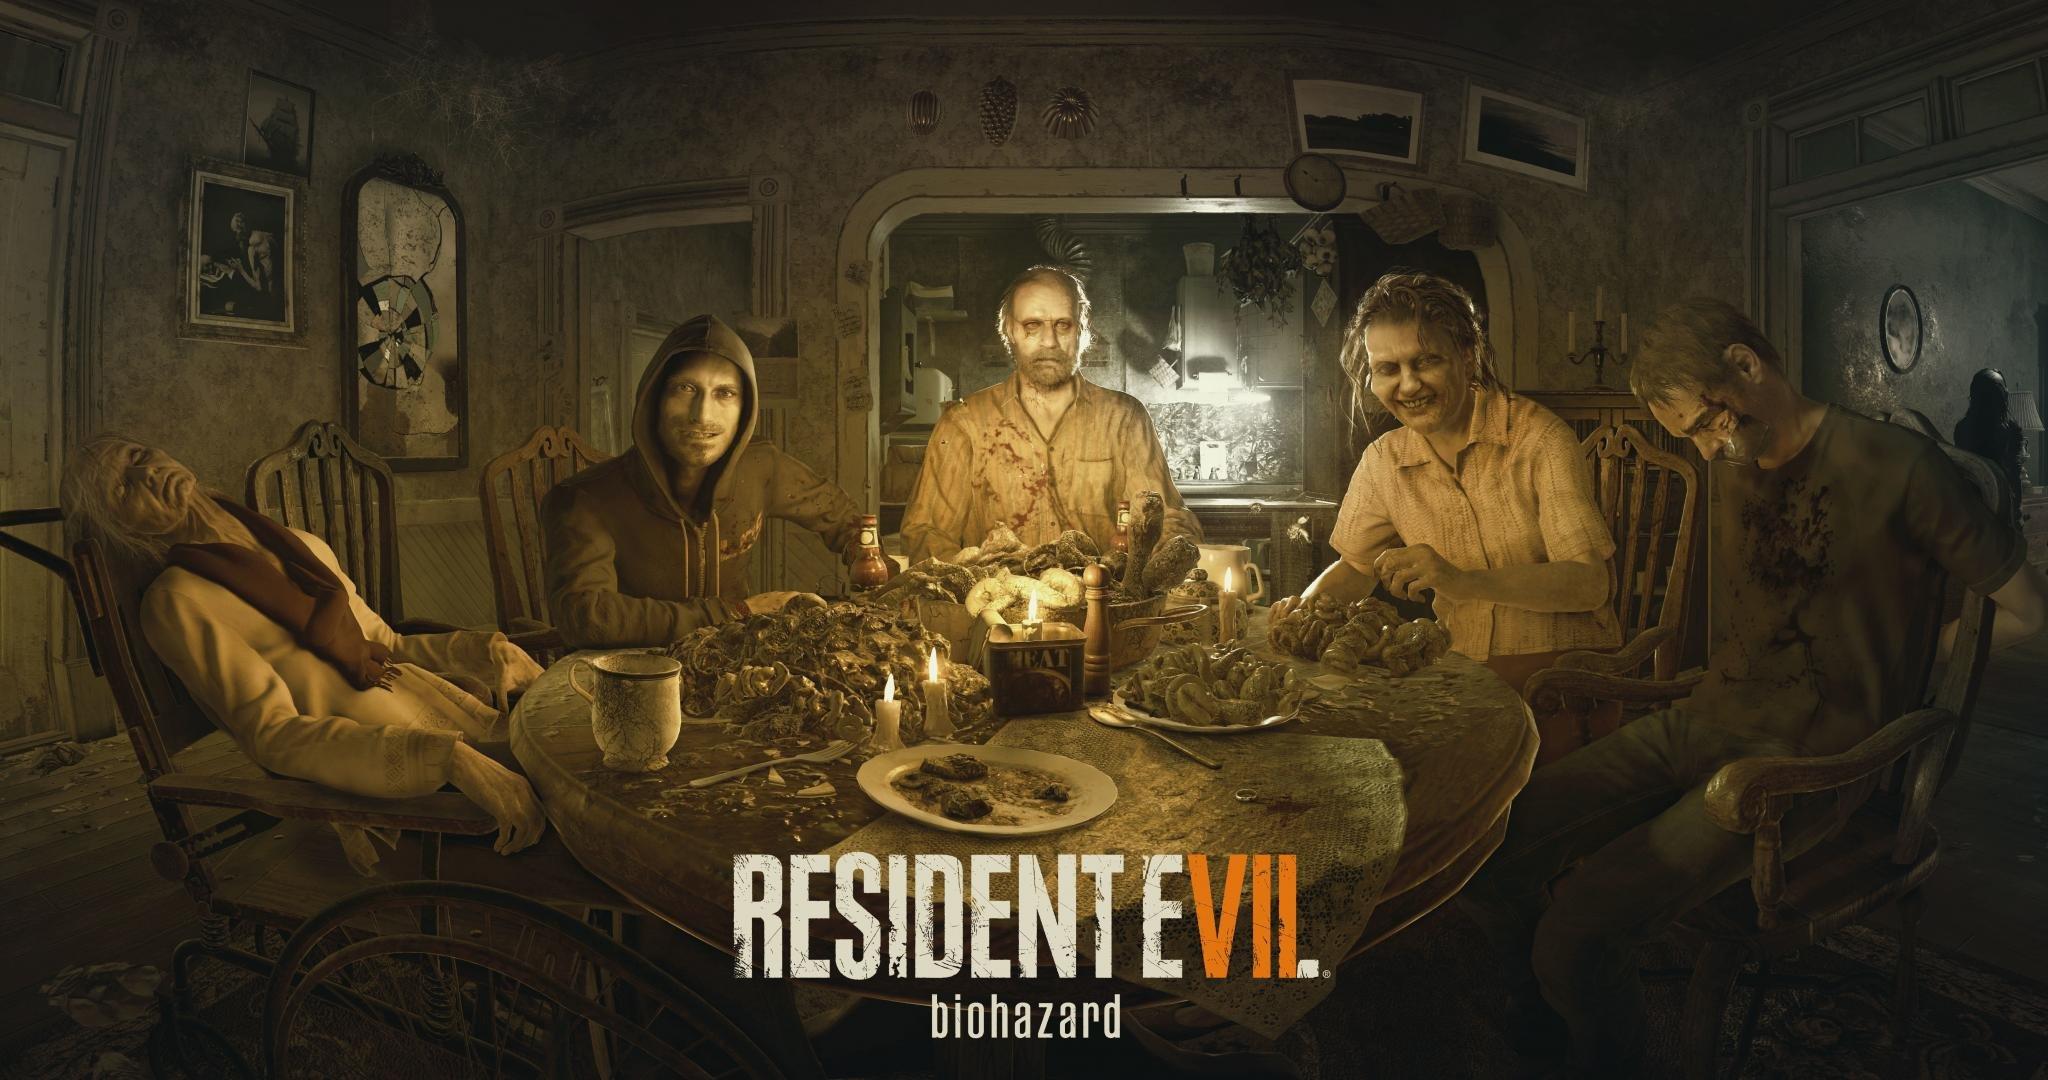 biohazard game free download pc